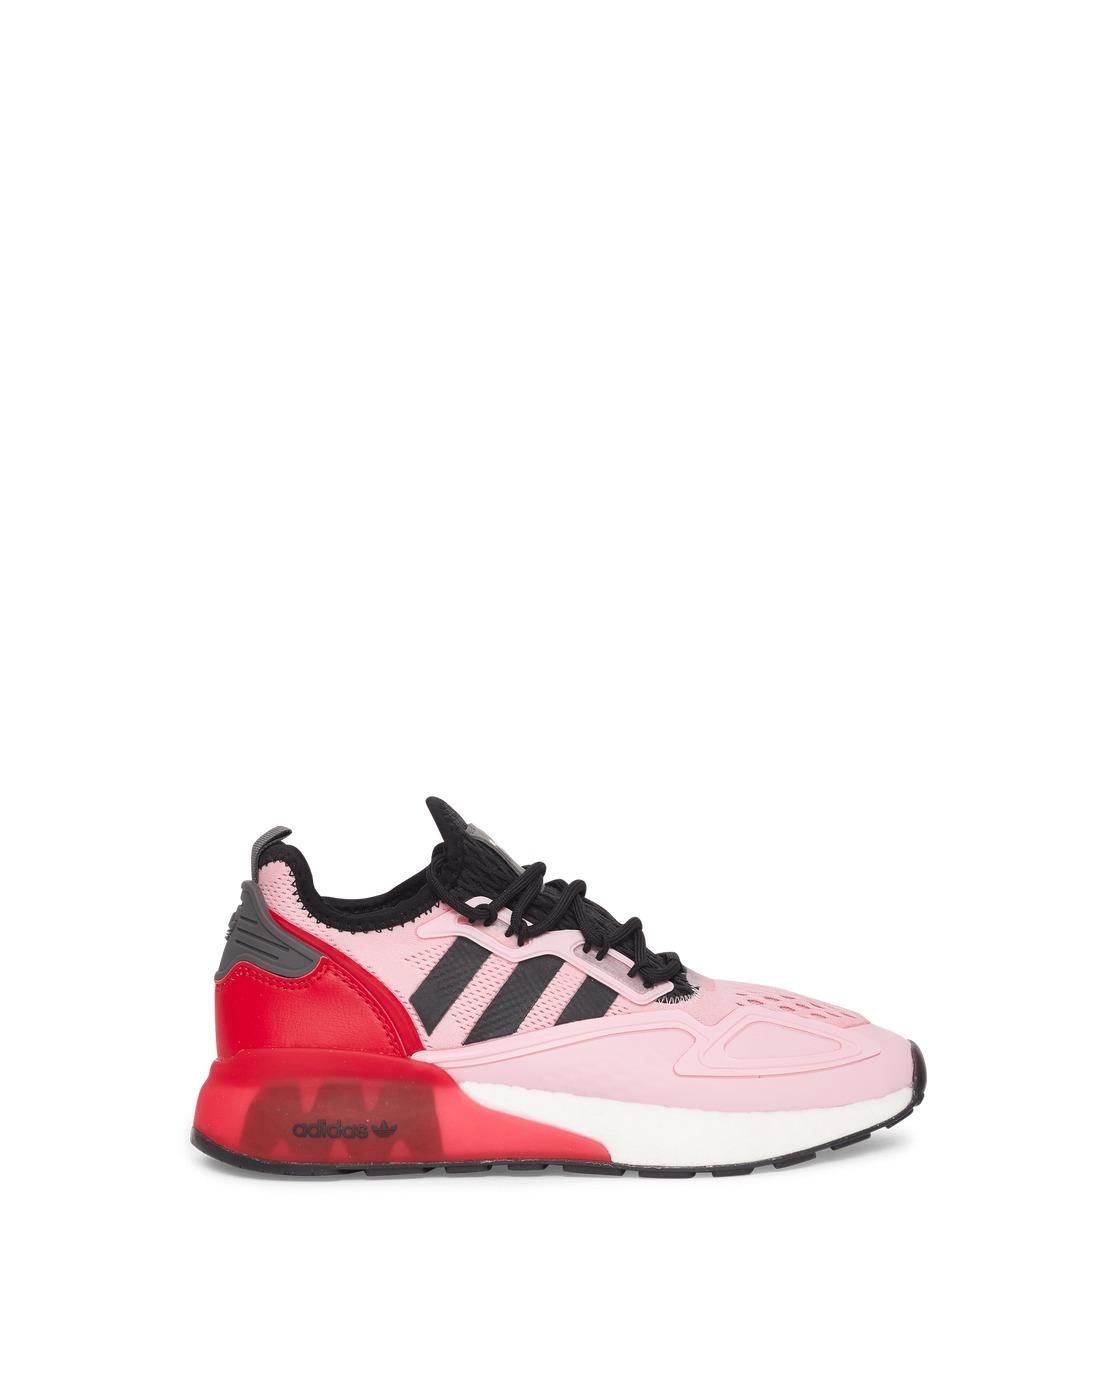 Adidas Originals Ninja Zx 2k Boost J Sneakers Pink/Black 36